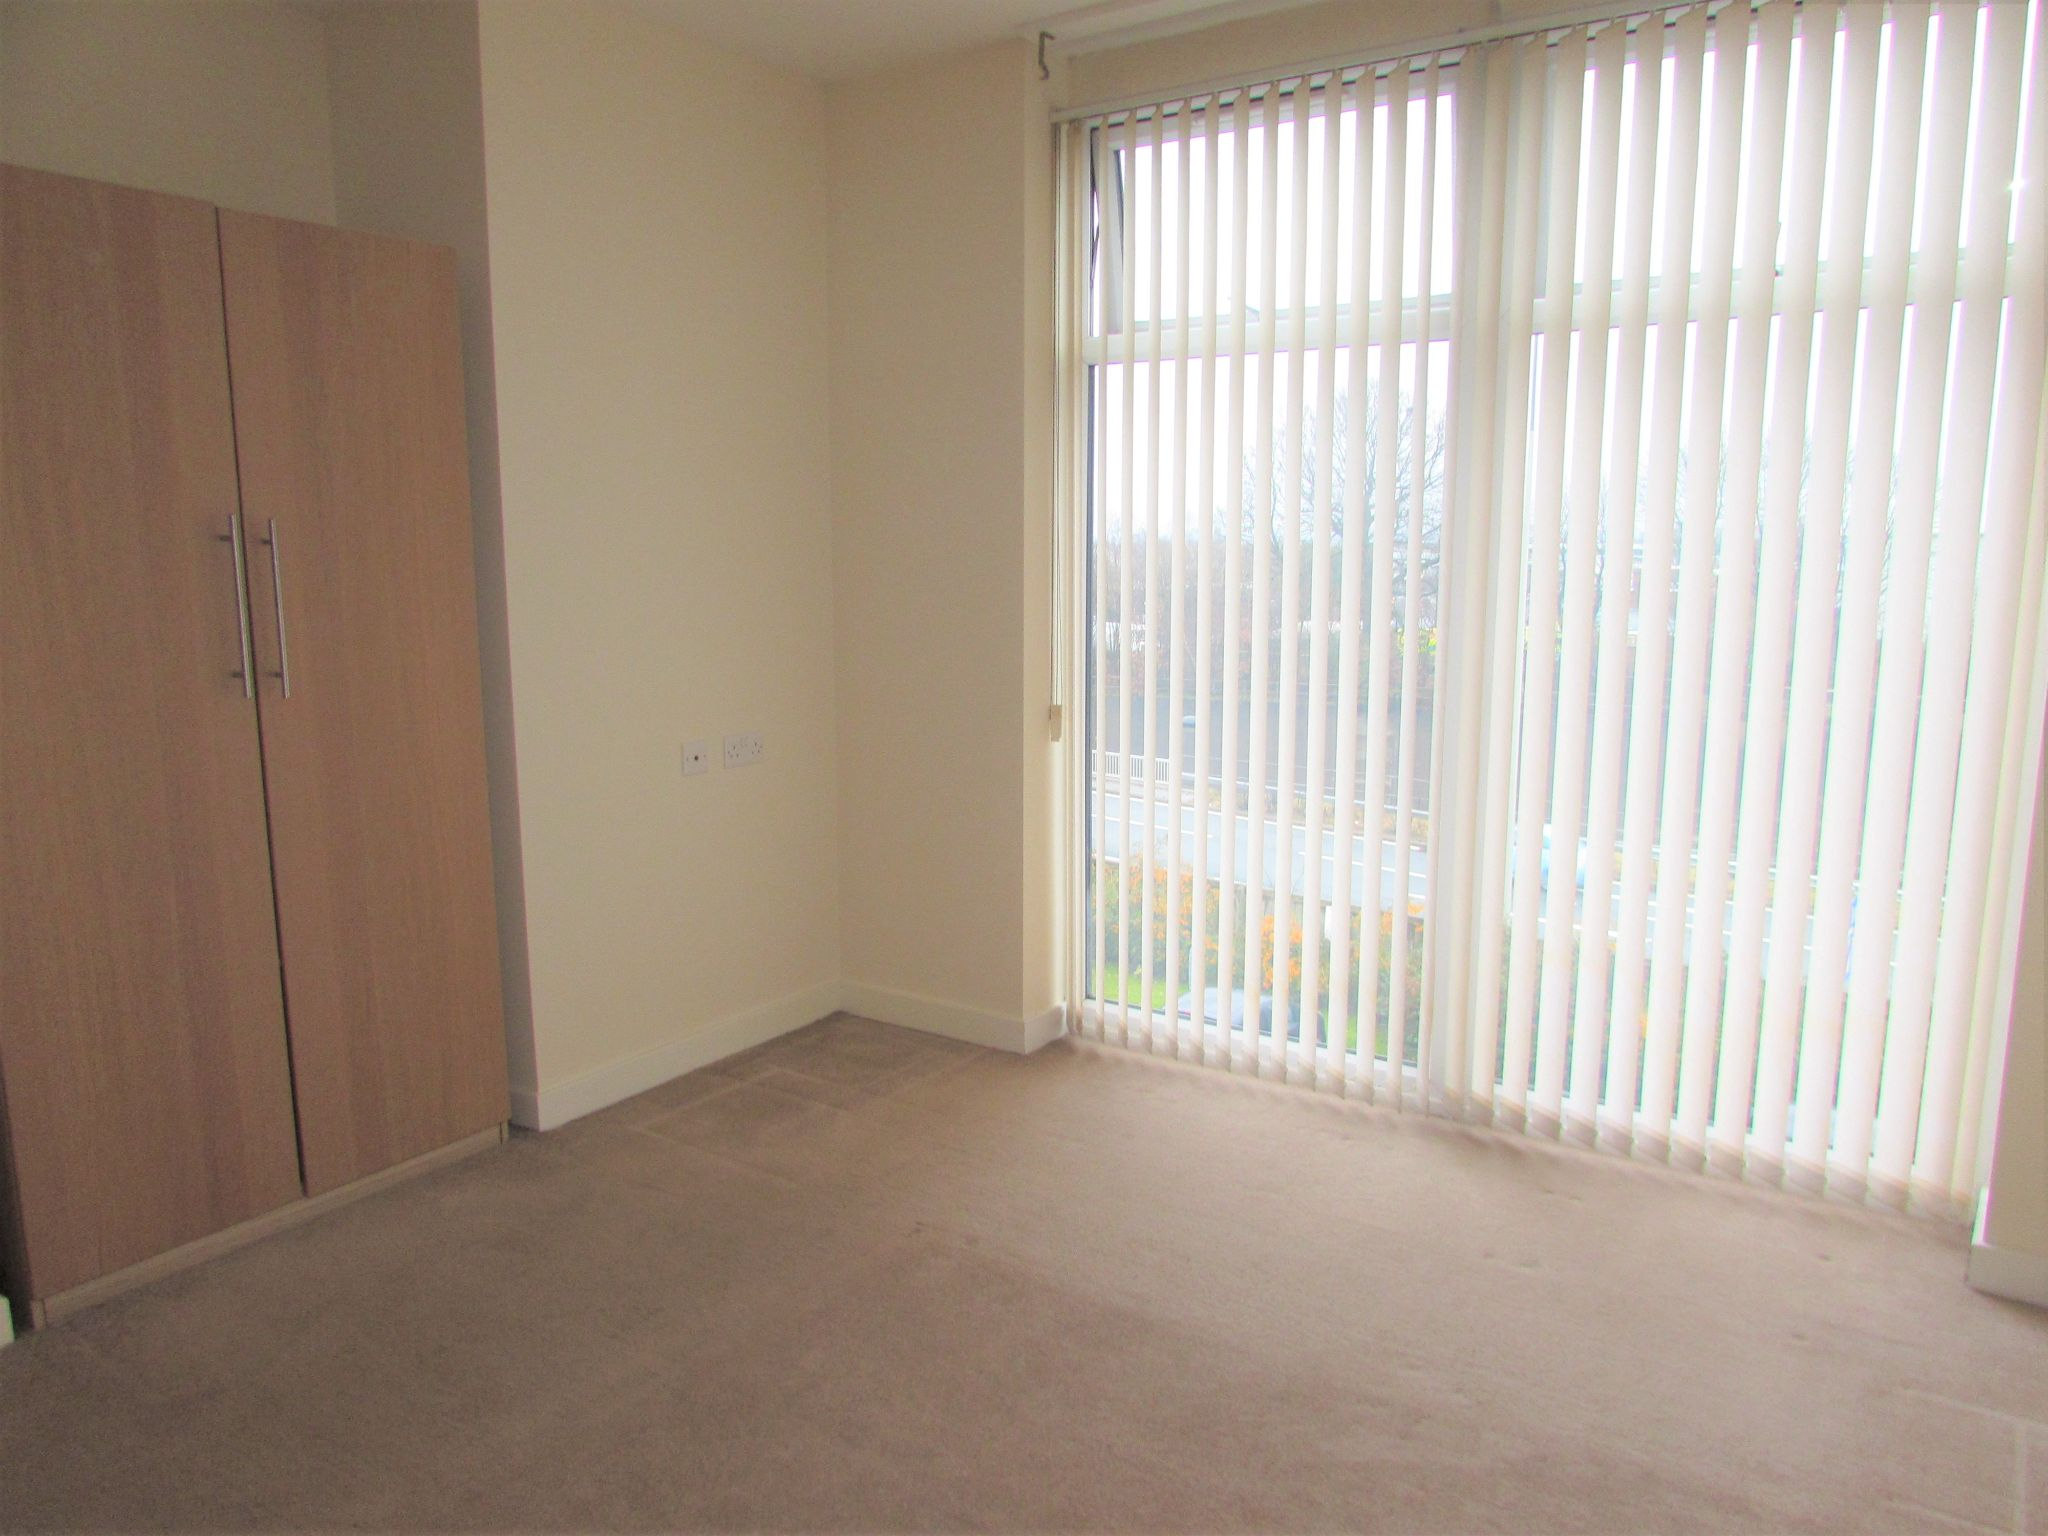 2 Bedroom Apartment Flat/apartment To Rent - Bedroom 1